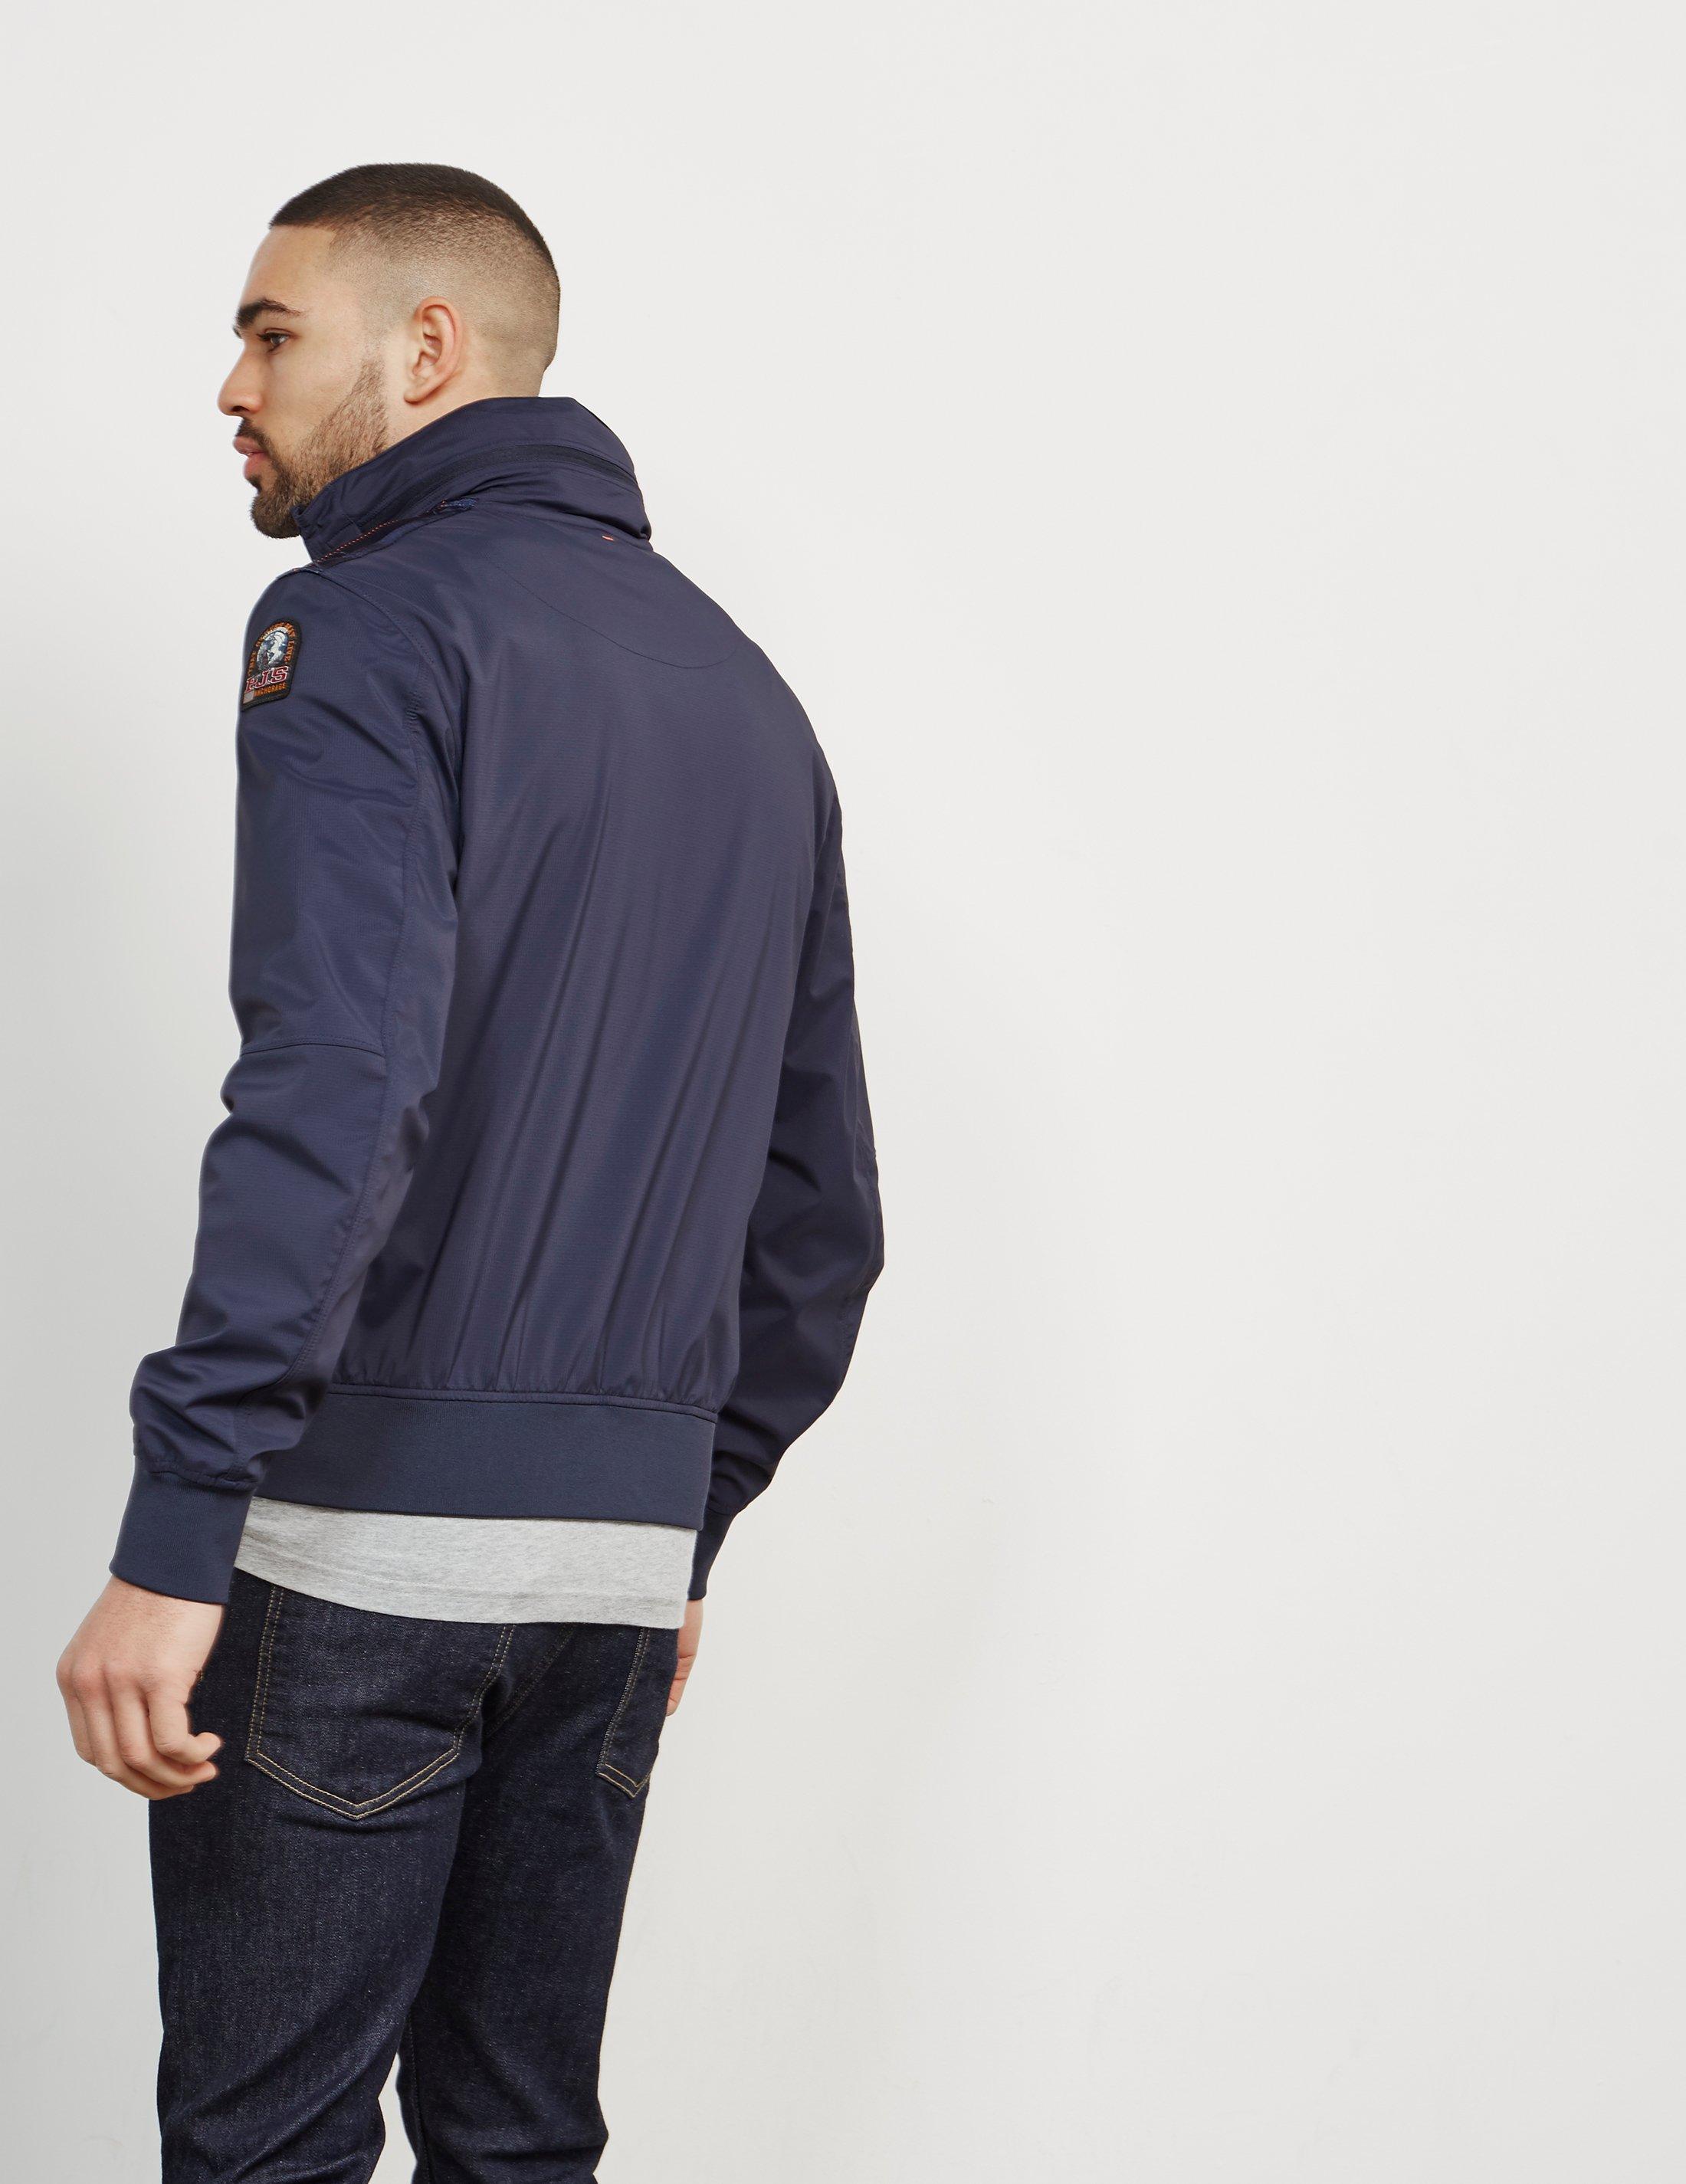 parajumpers miles jacket